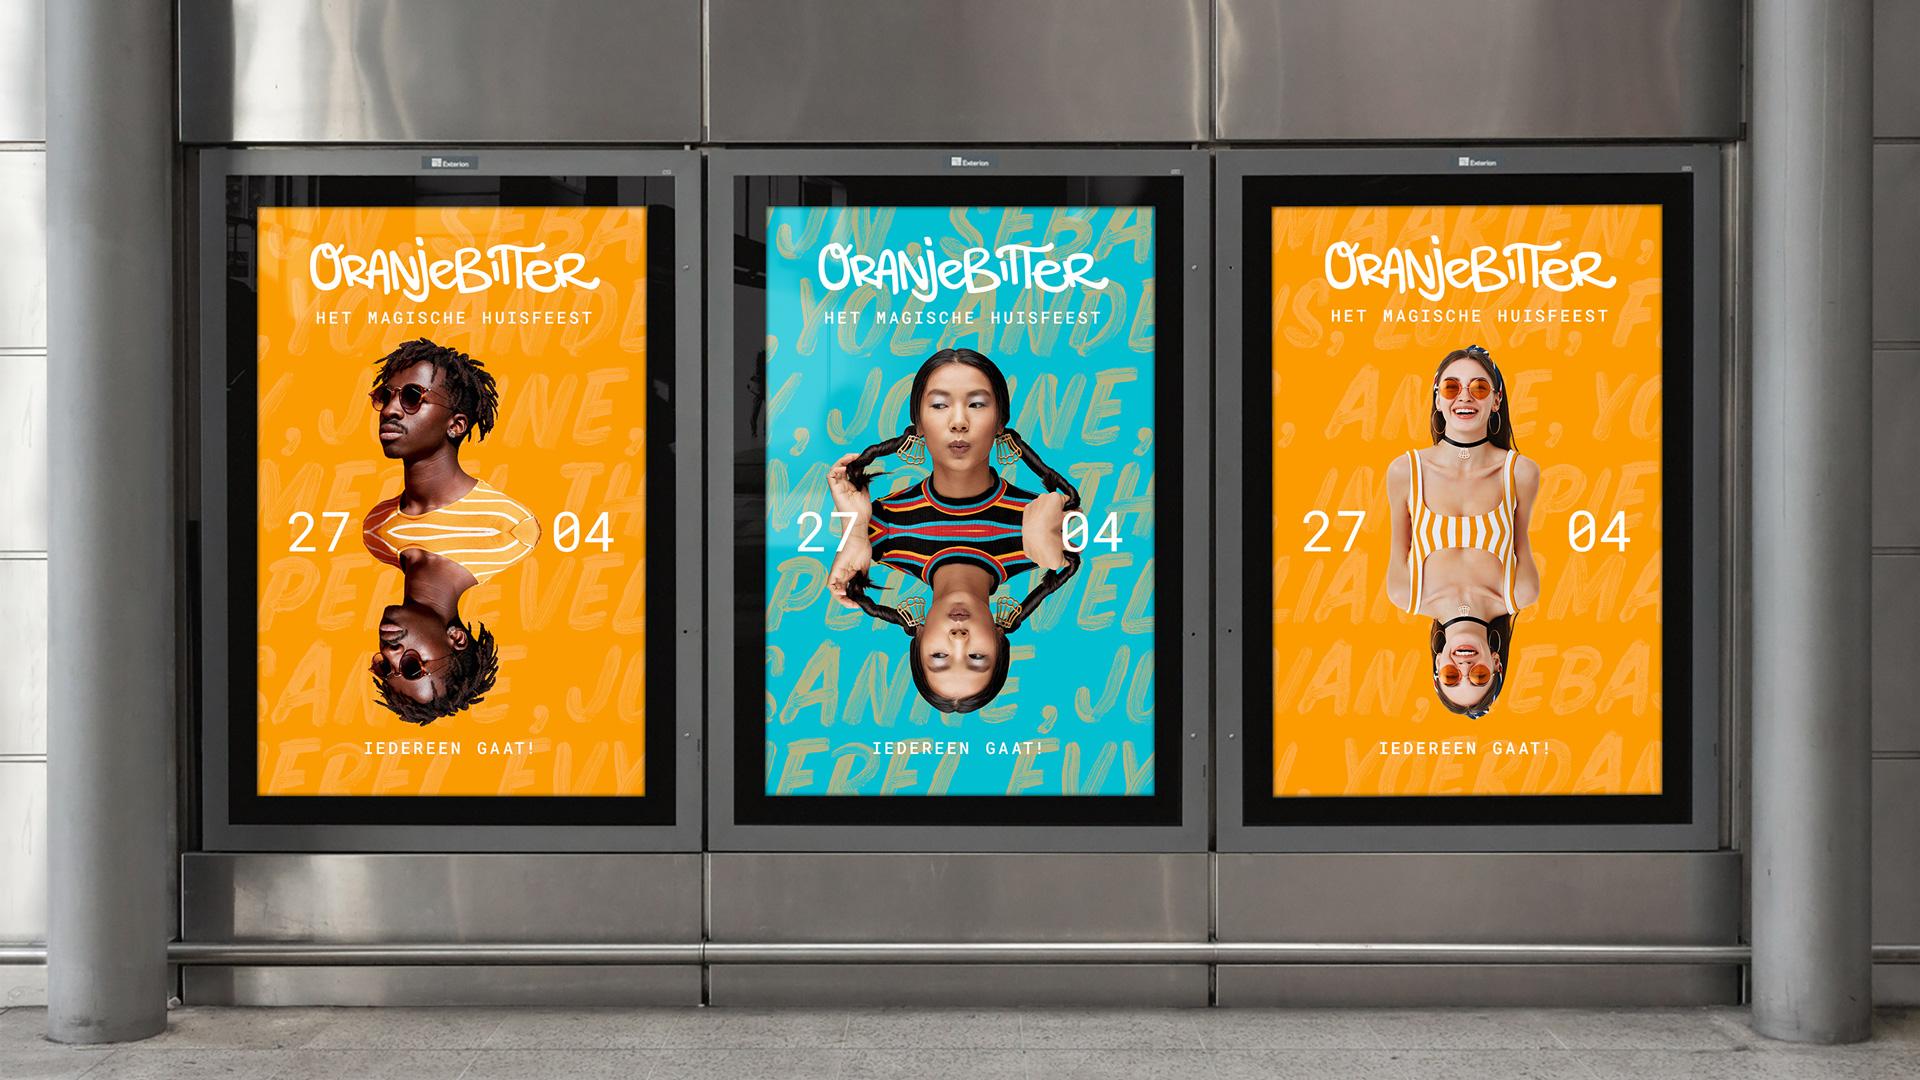 Campagne-Oranjebitter